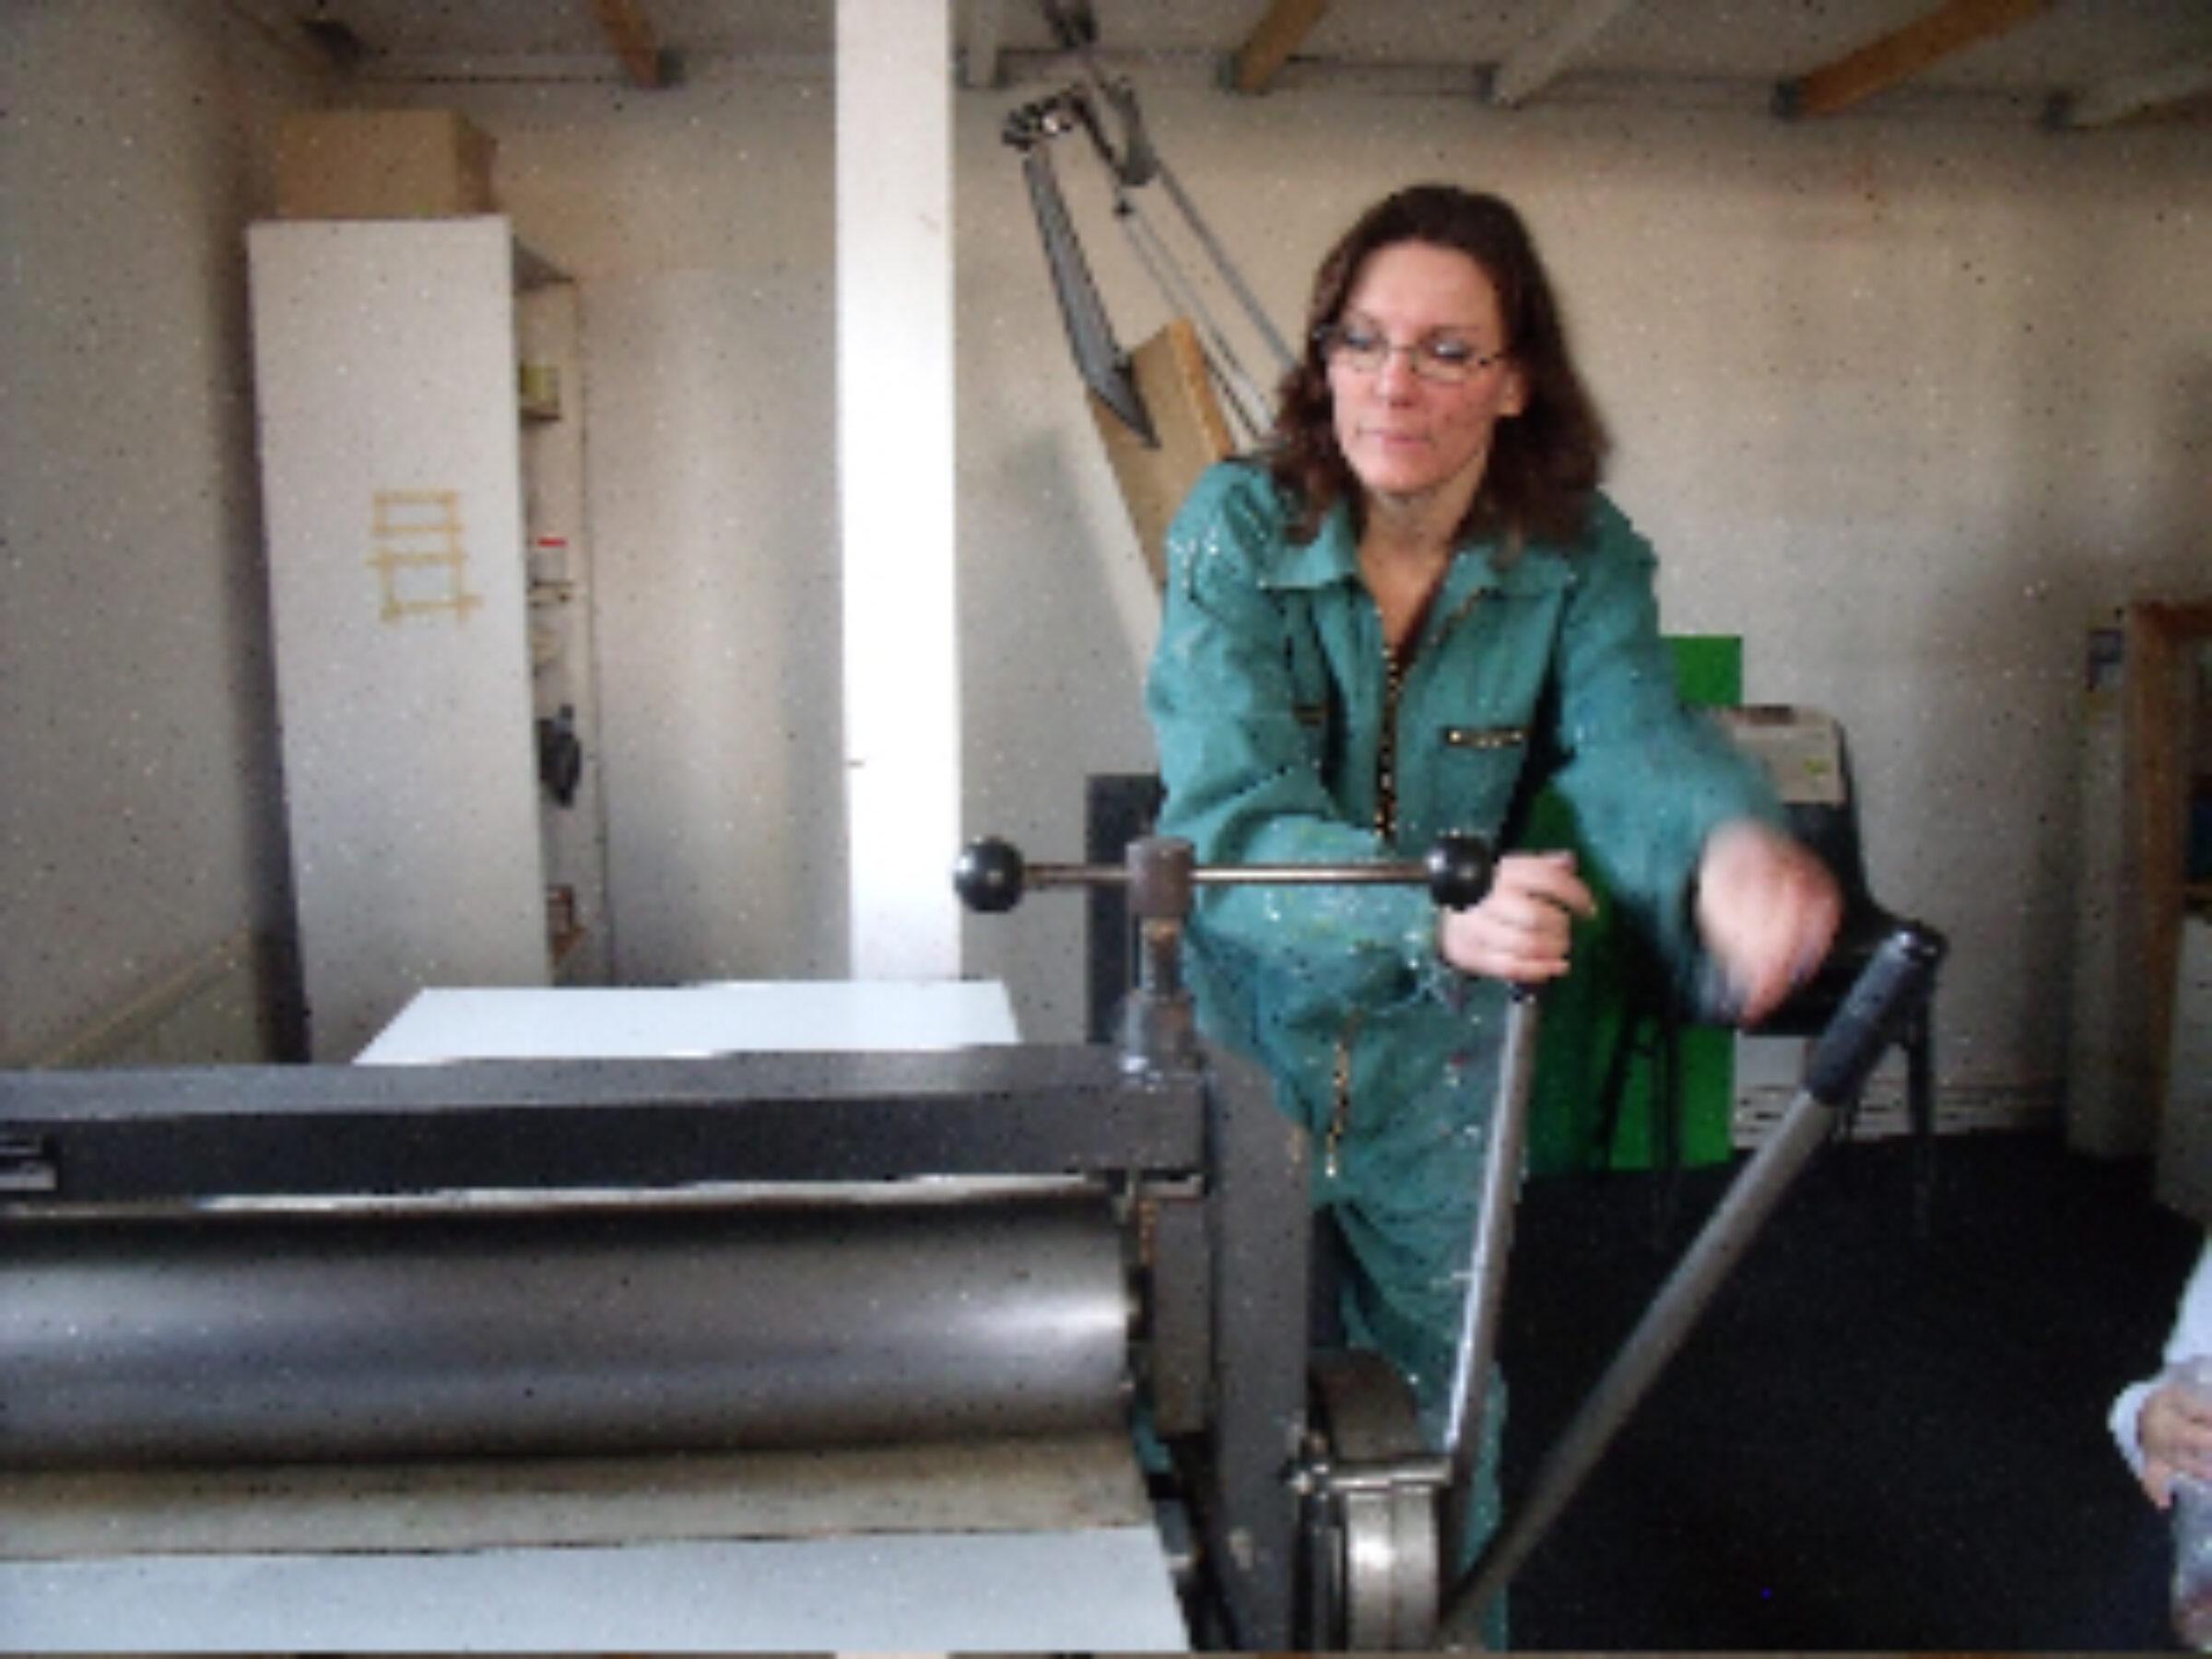 Fionarworkshop Zessprong Enschede